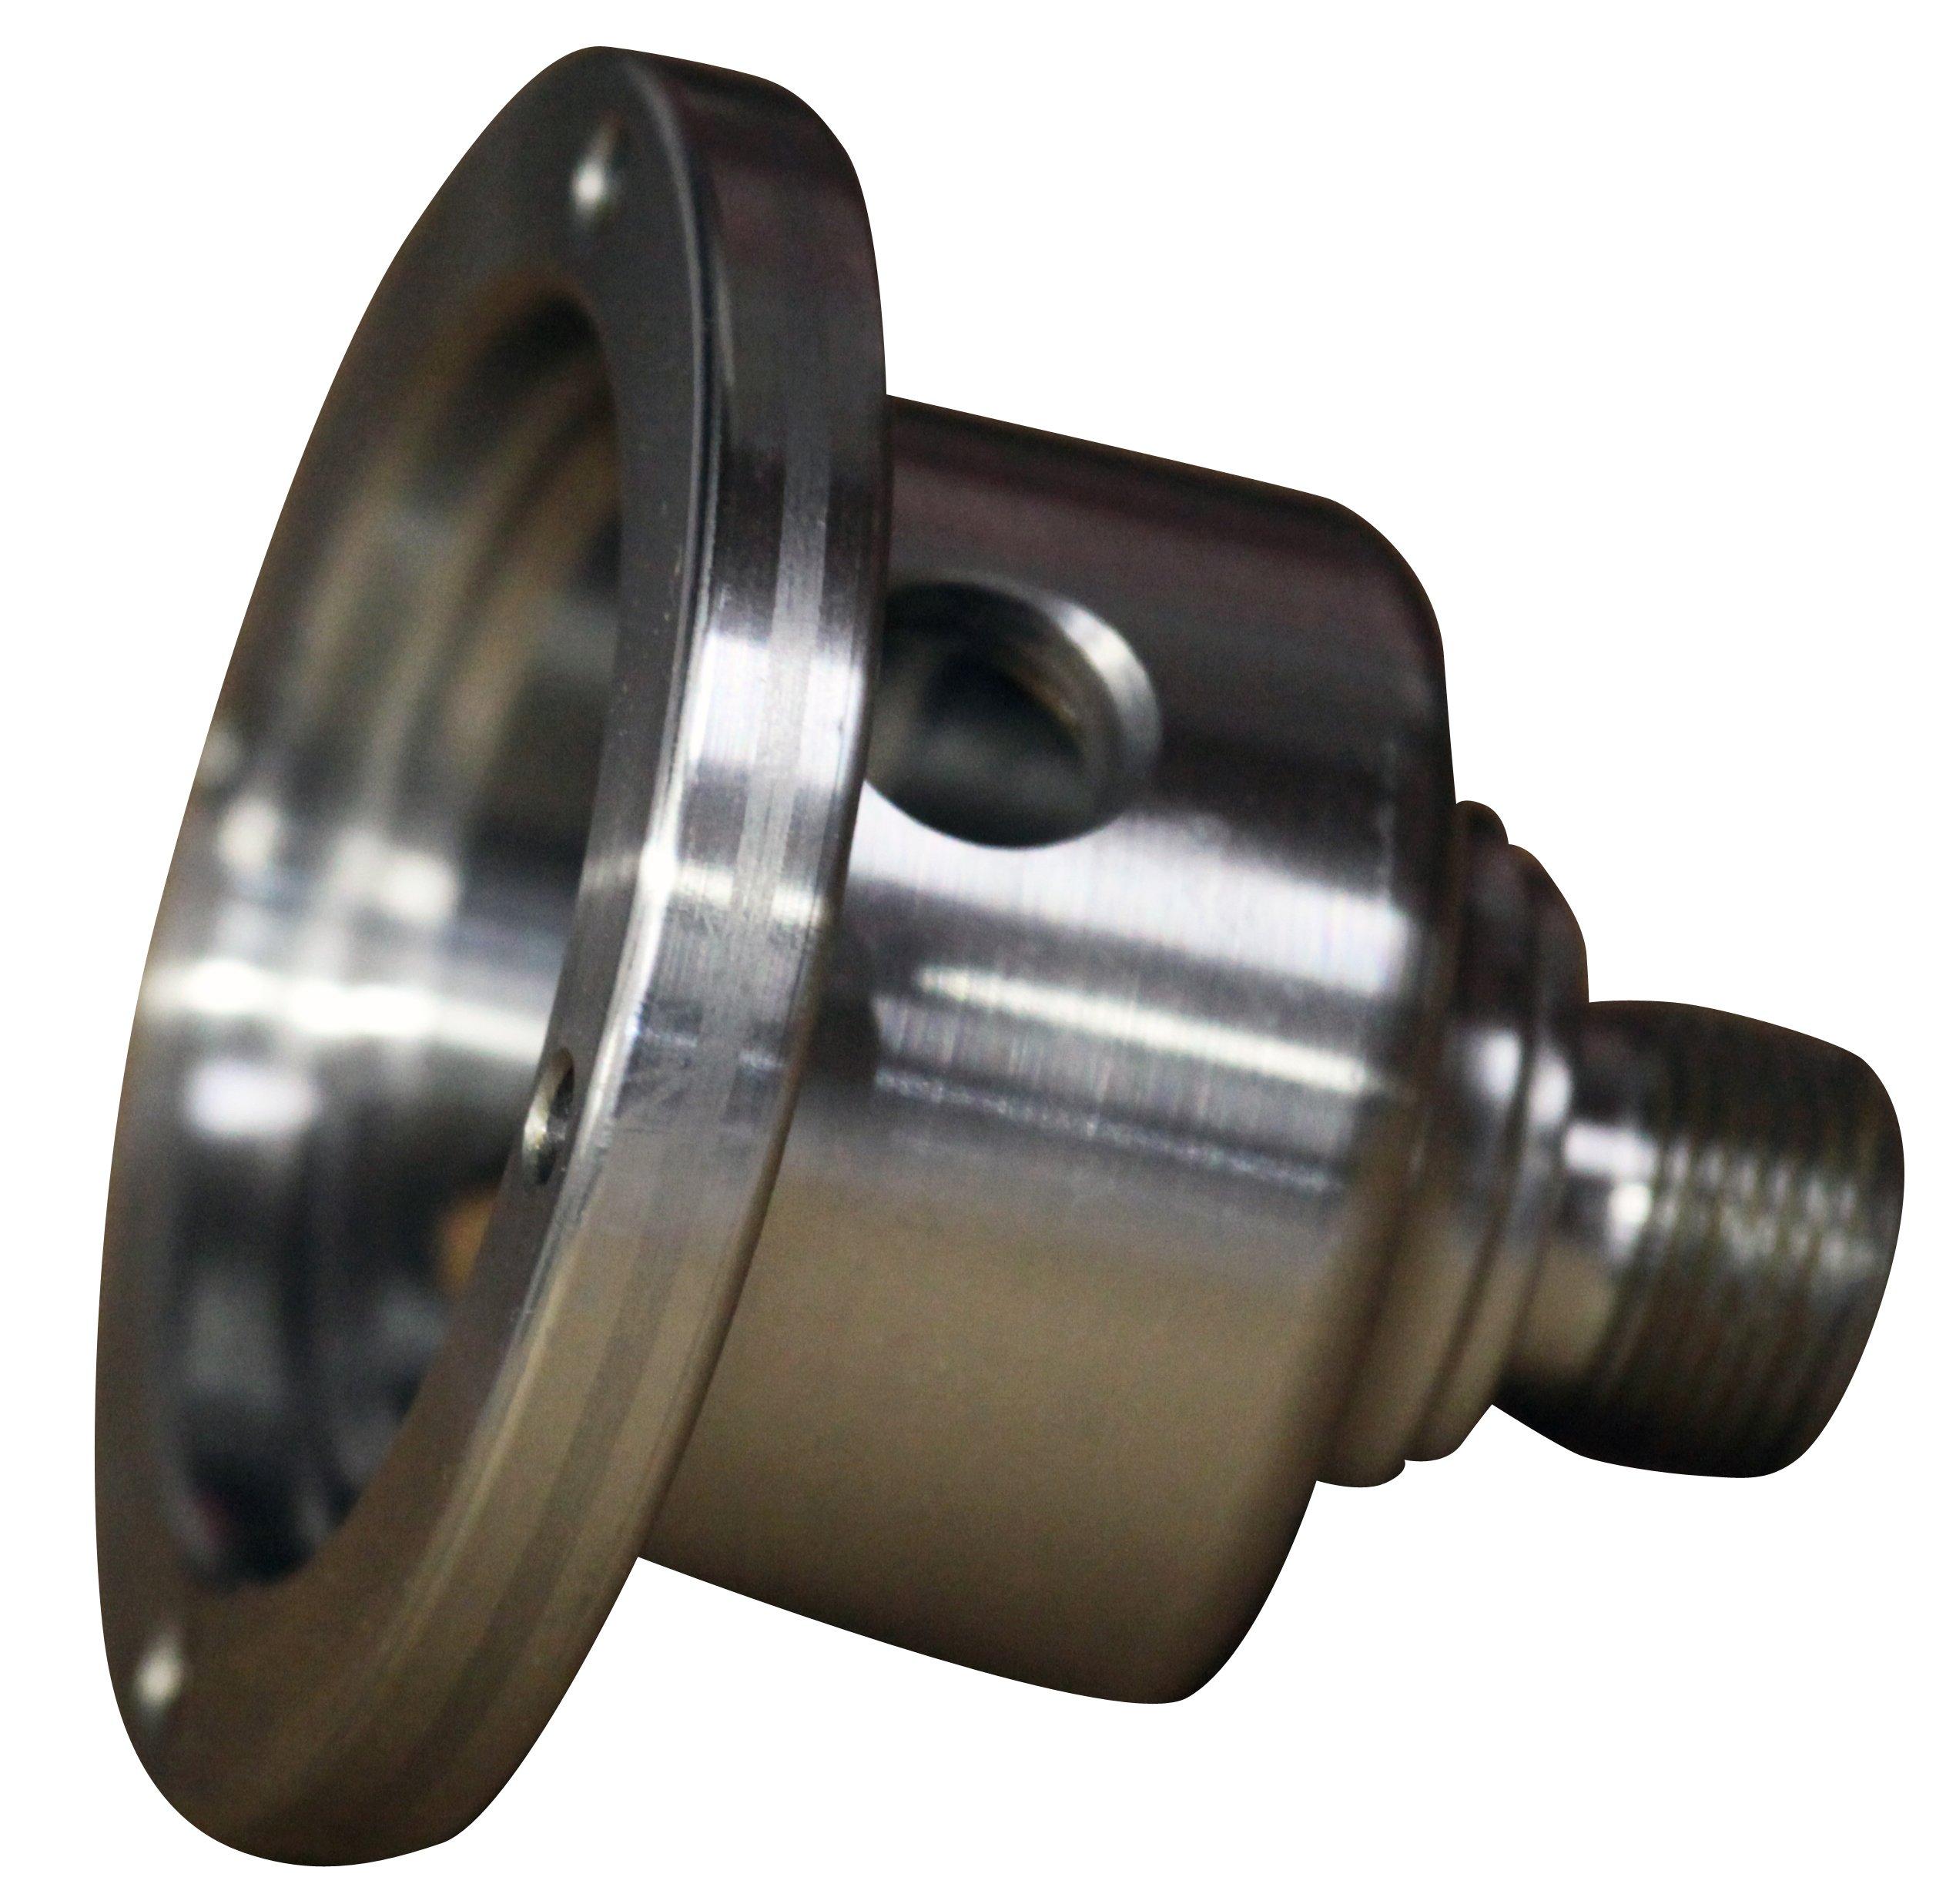 NOVA LHB Lathe Handwheel Accessory